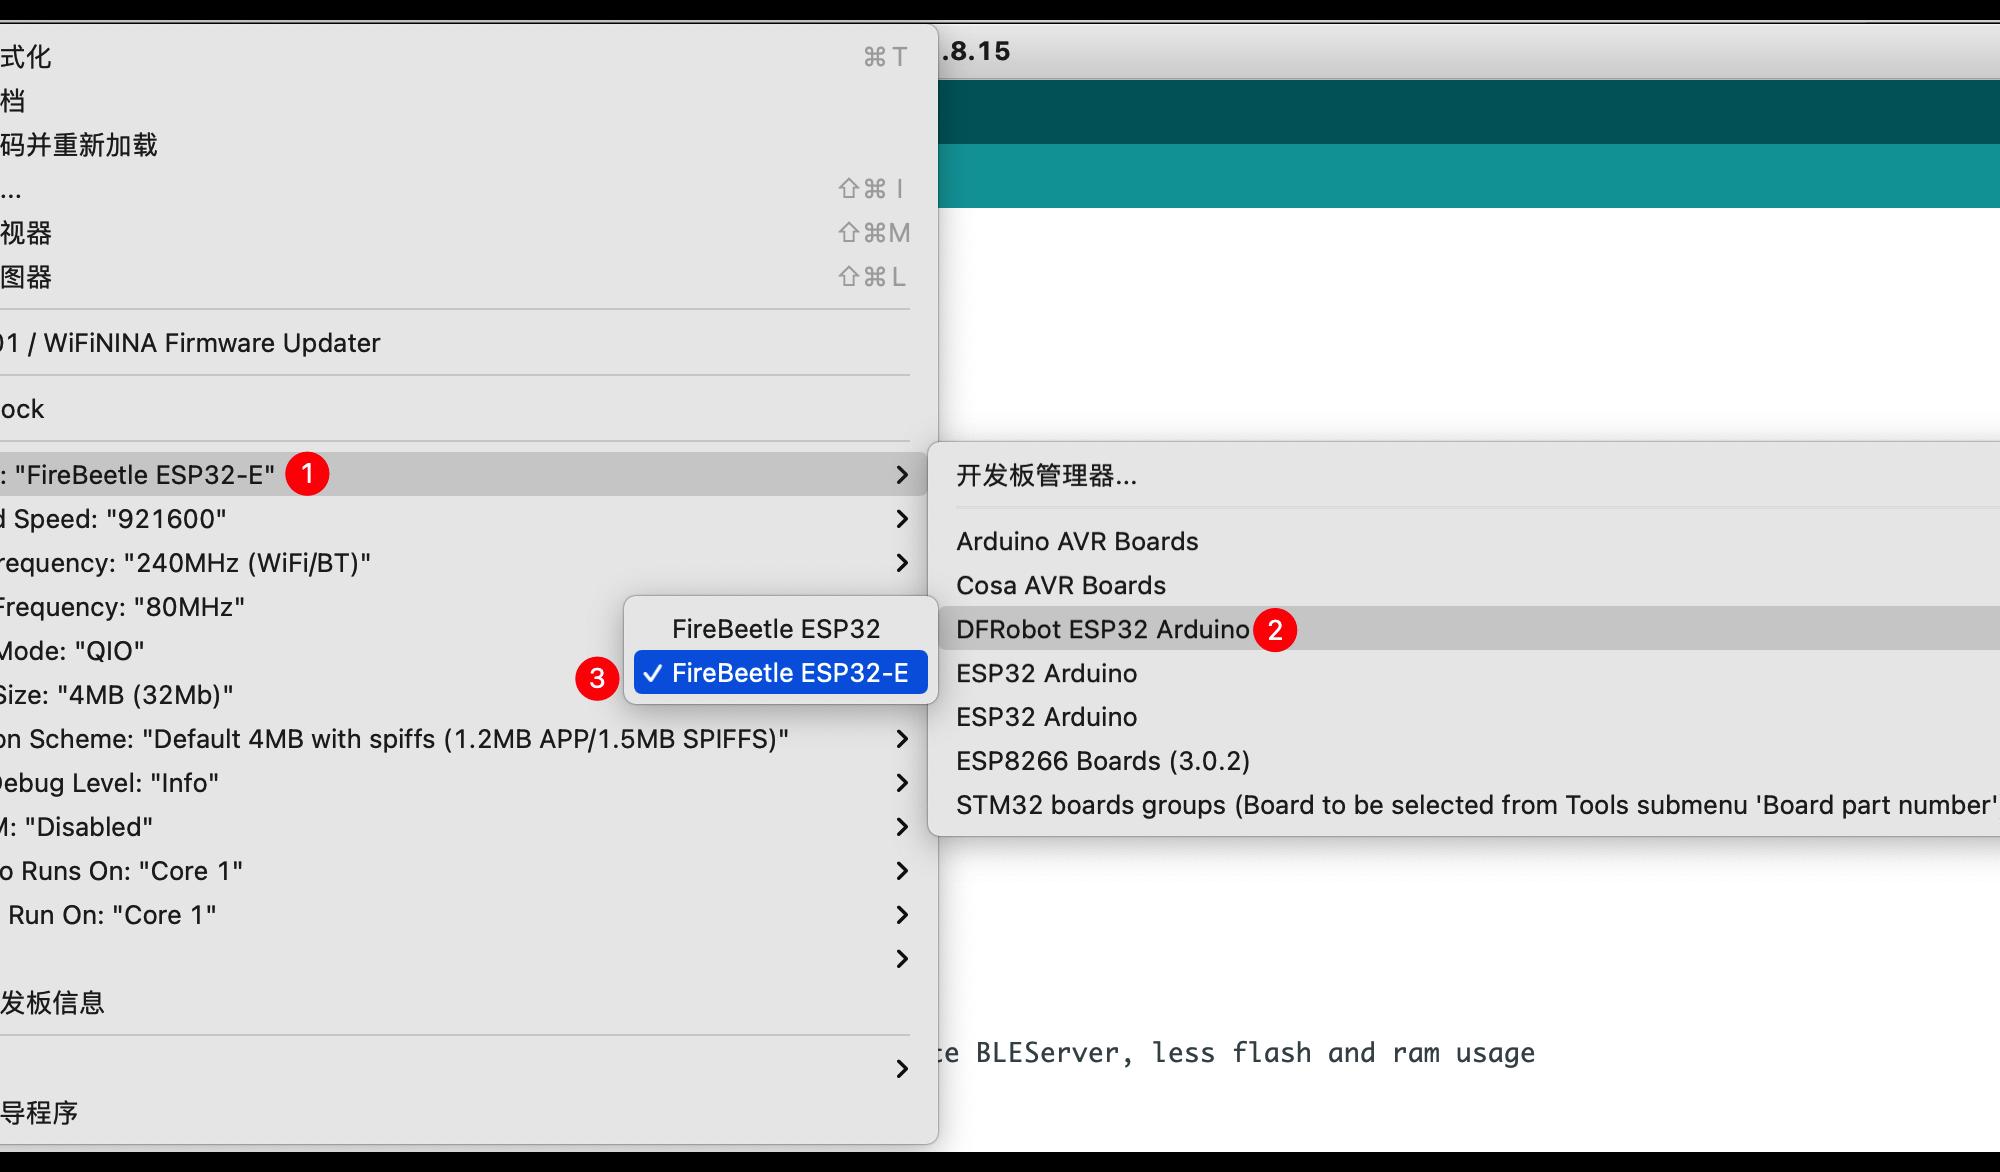 【FireBeetle Board ESP32-E IoT 开发板试用体验】iBeacon定位初阶